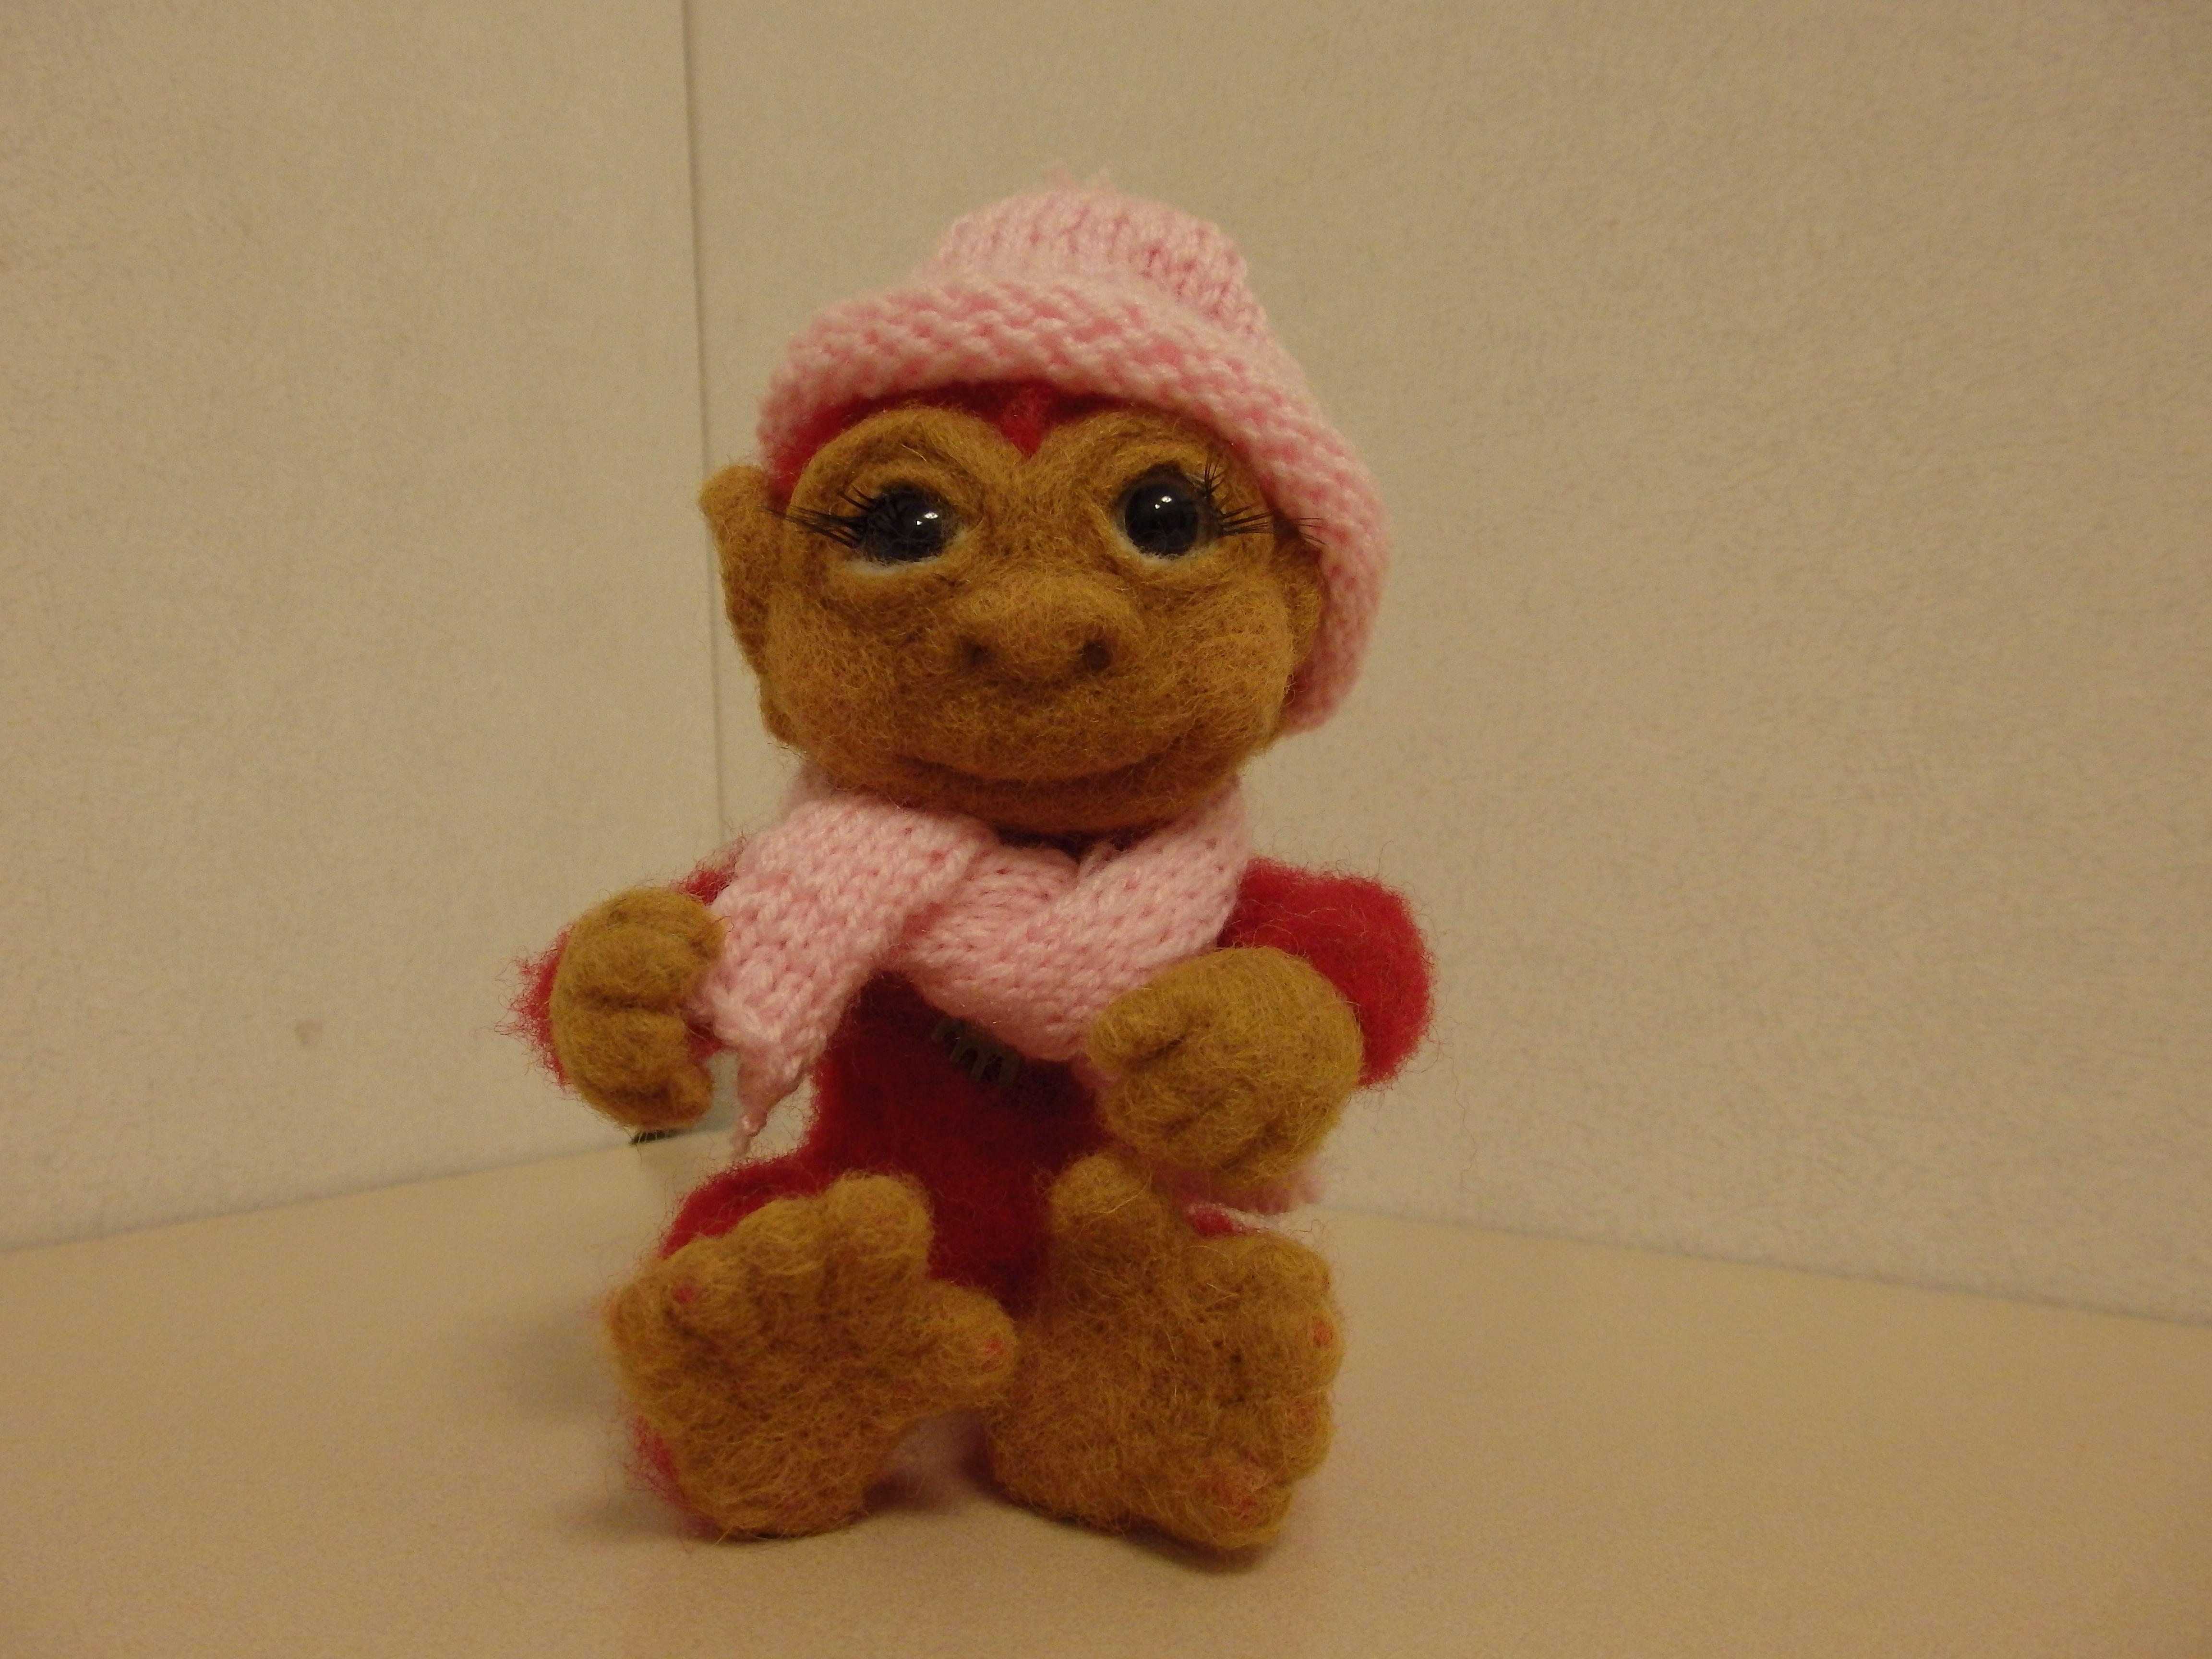 мартышка обезьянахендмейдсувениризроссииигрушкаизшерстиподарокваляниеработасухоеваляниеручнаяёжик малышка обезьянка